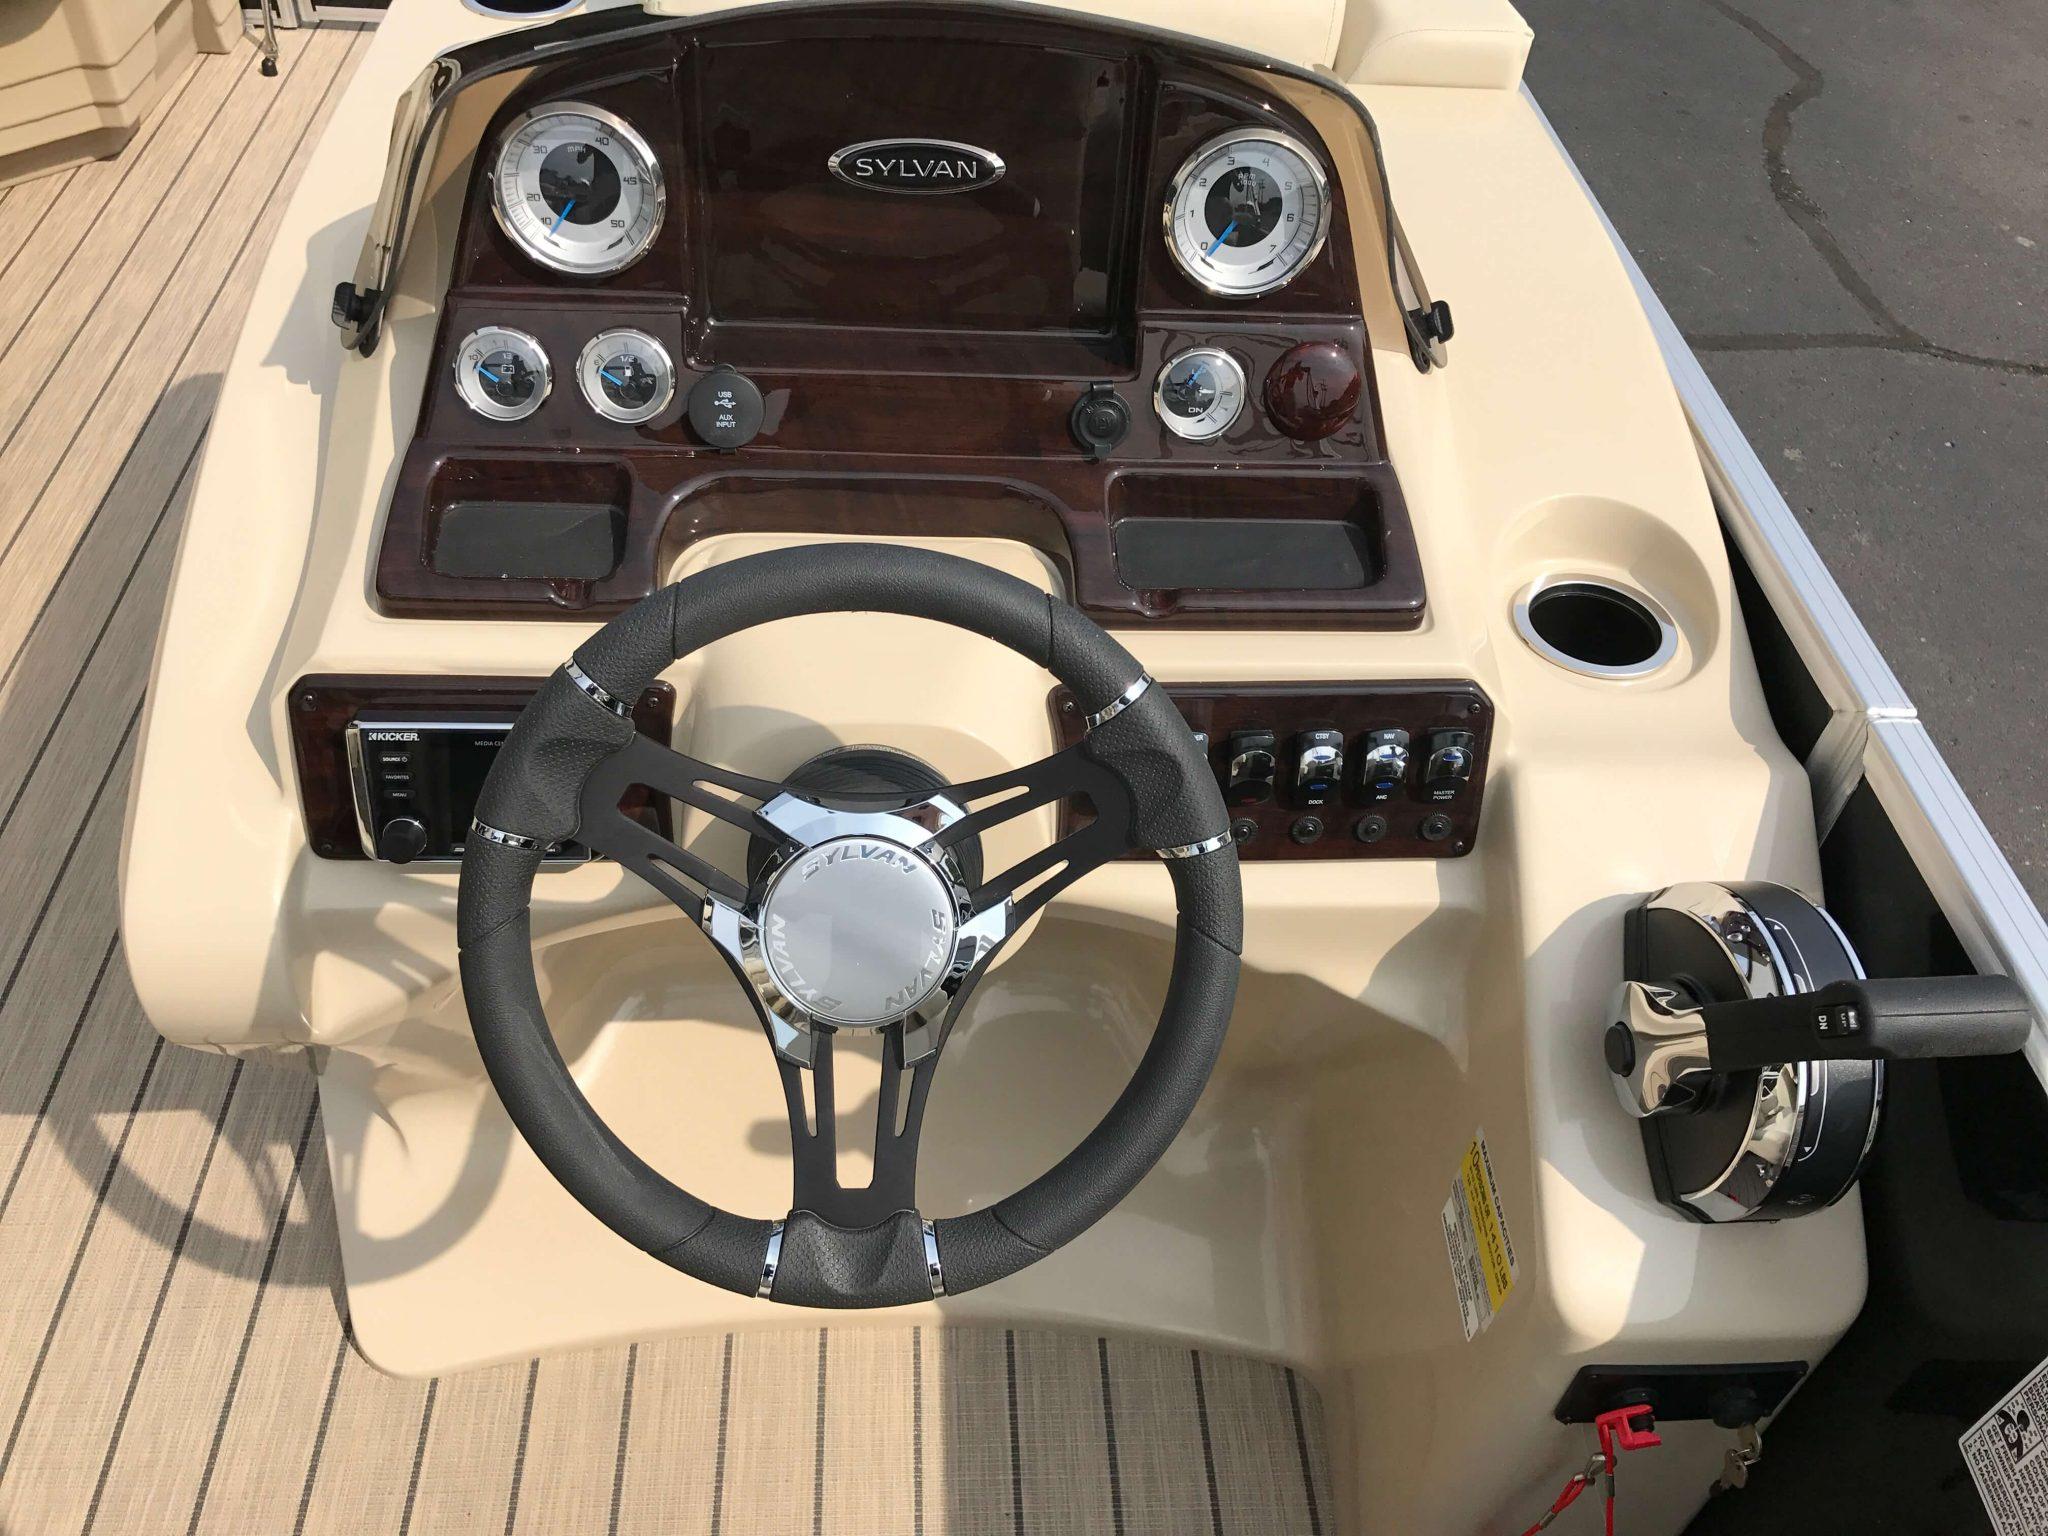 2019 Sylvan 8520 LZ LE Helm And Dash